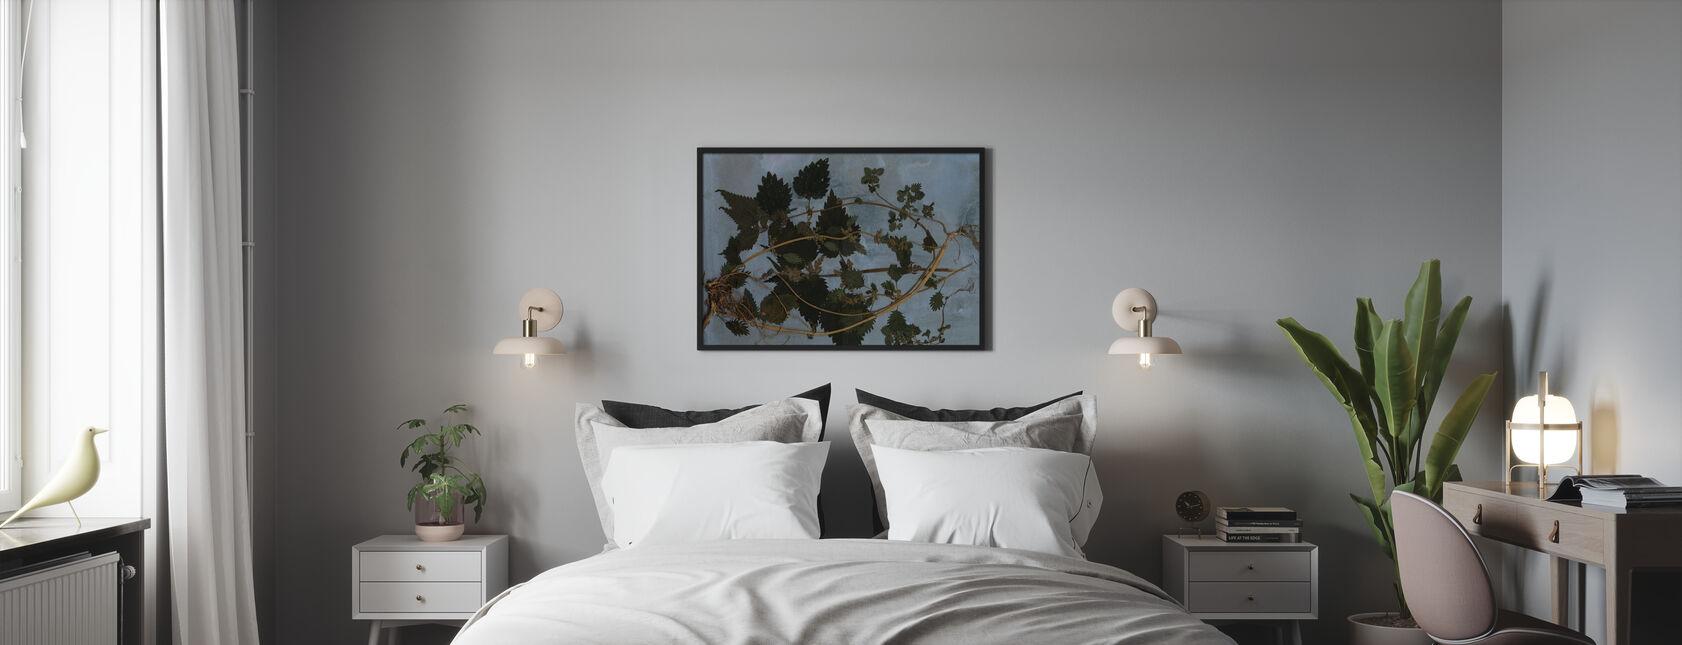 Brandnetels - Ingelijste print - Slaapkamer